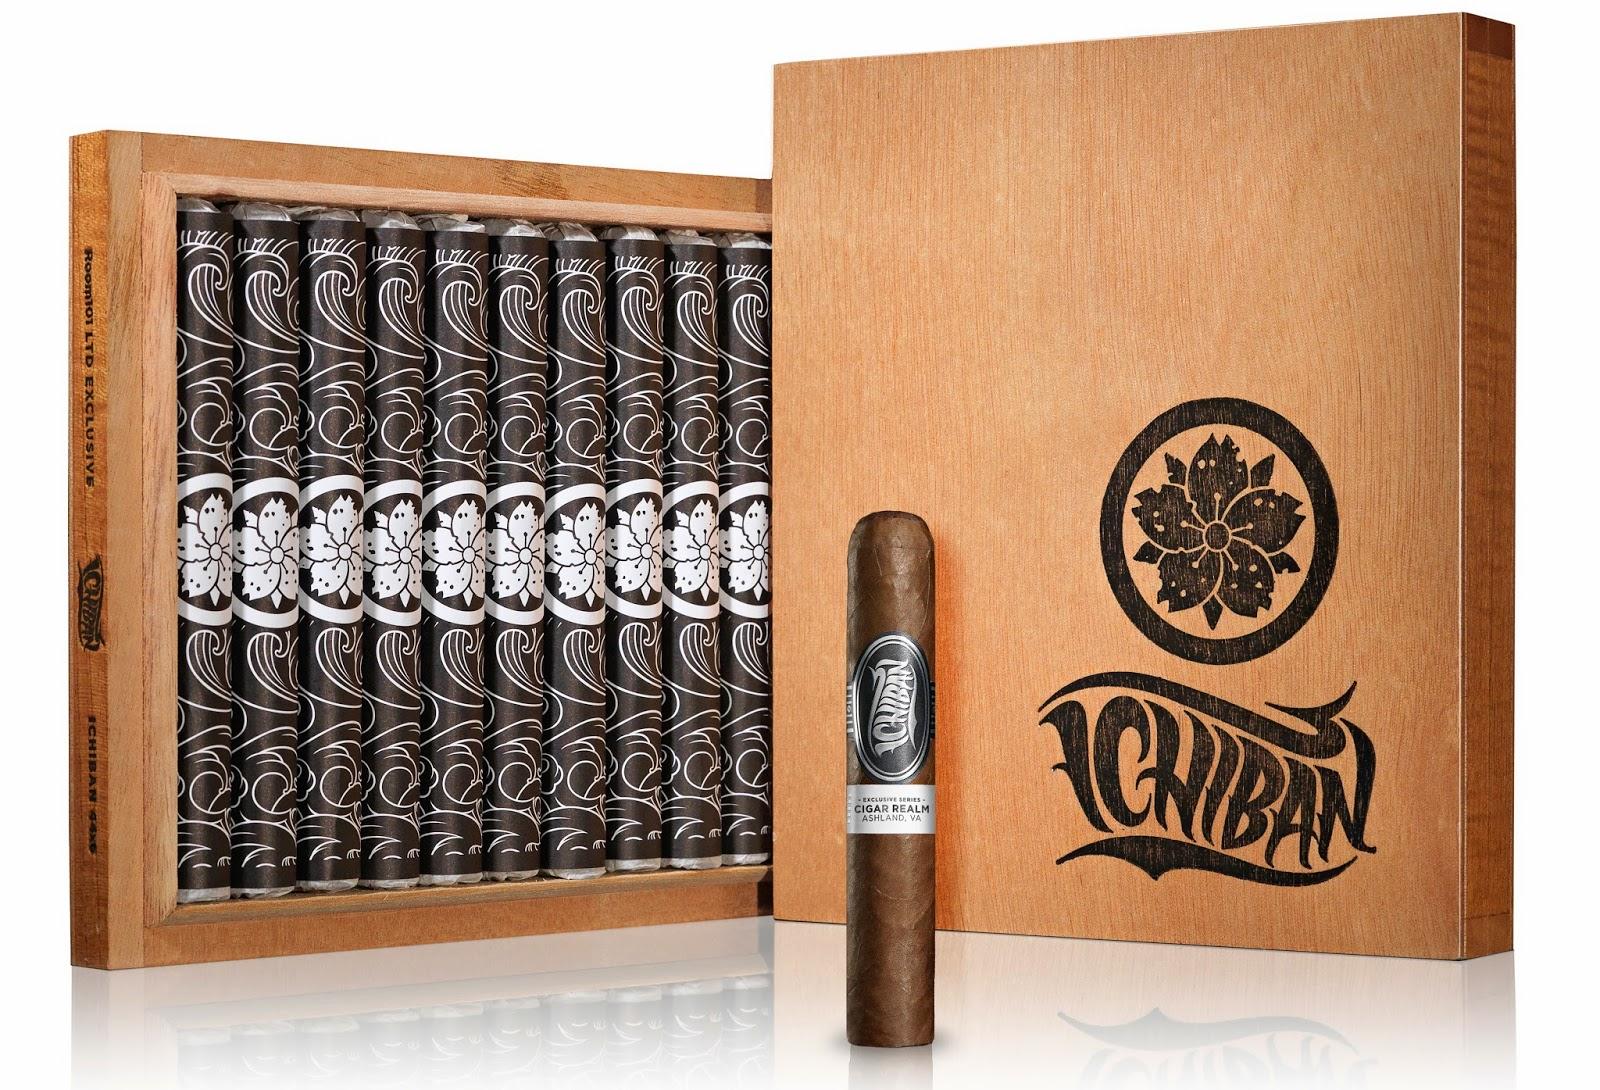 Cigar News: Room101 Ichiban Roxxo Heading to Cigar Realm in Ashland, Virginia